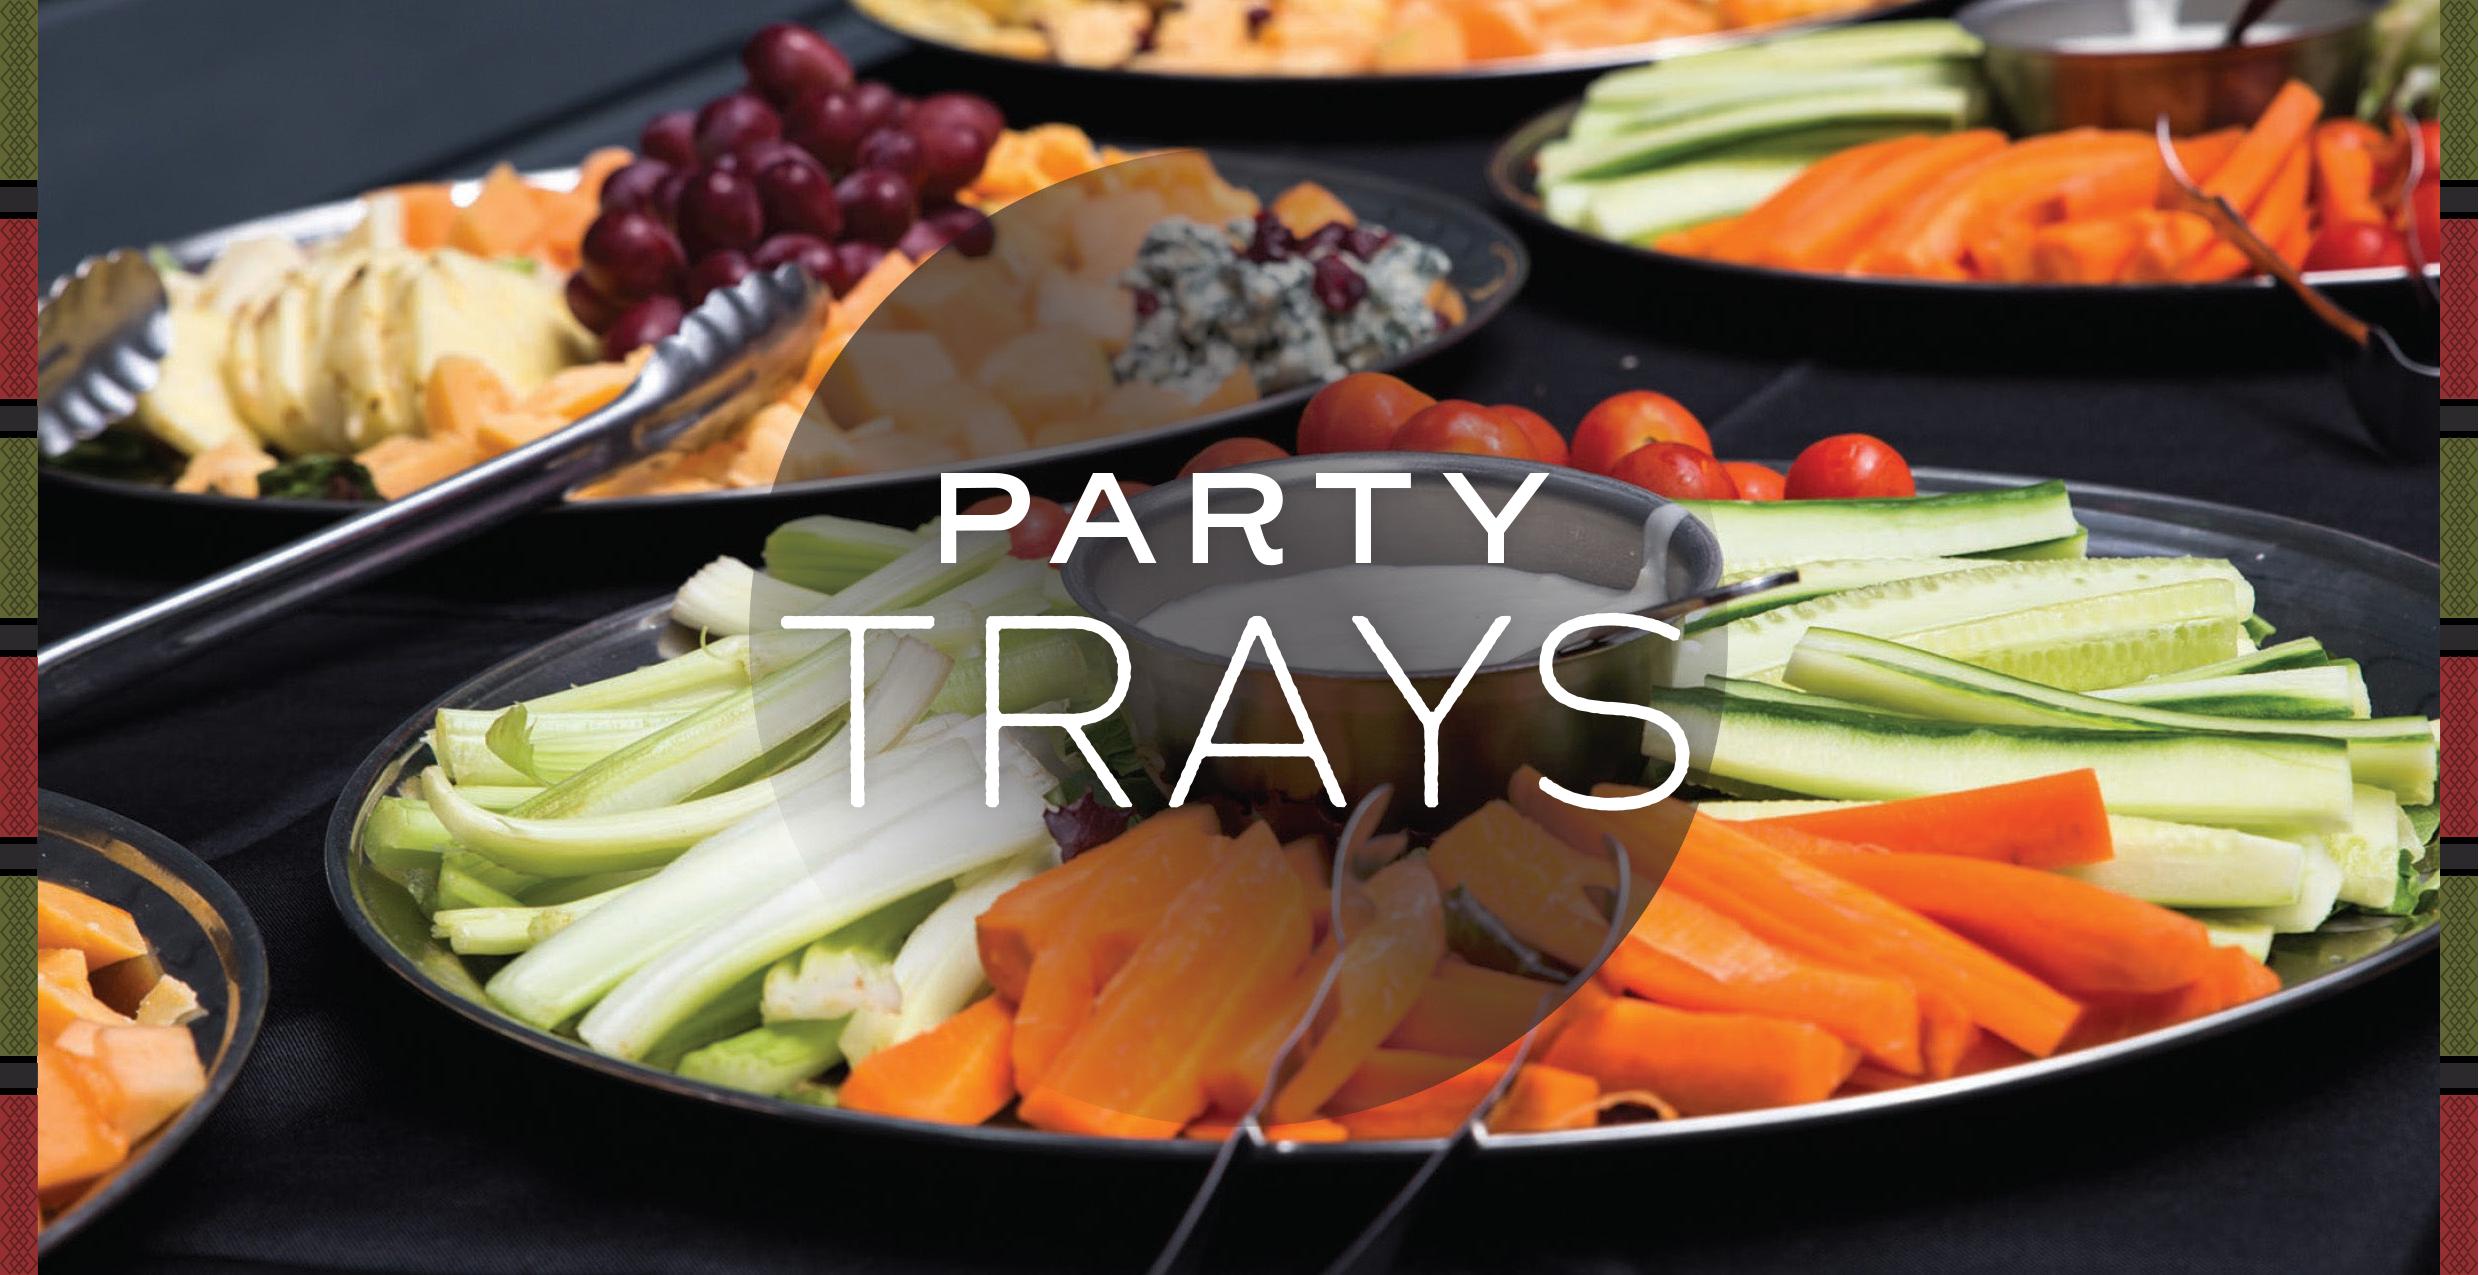 Raintree Party Trays